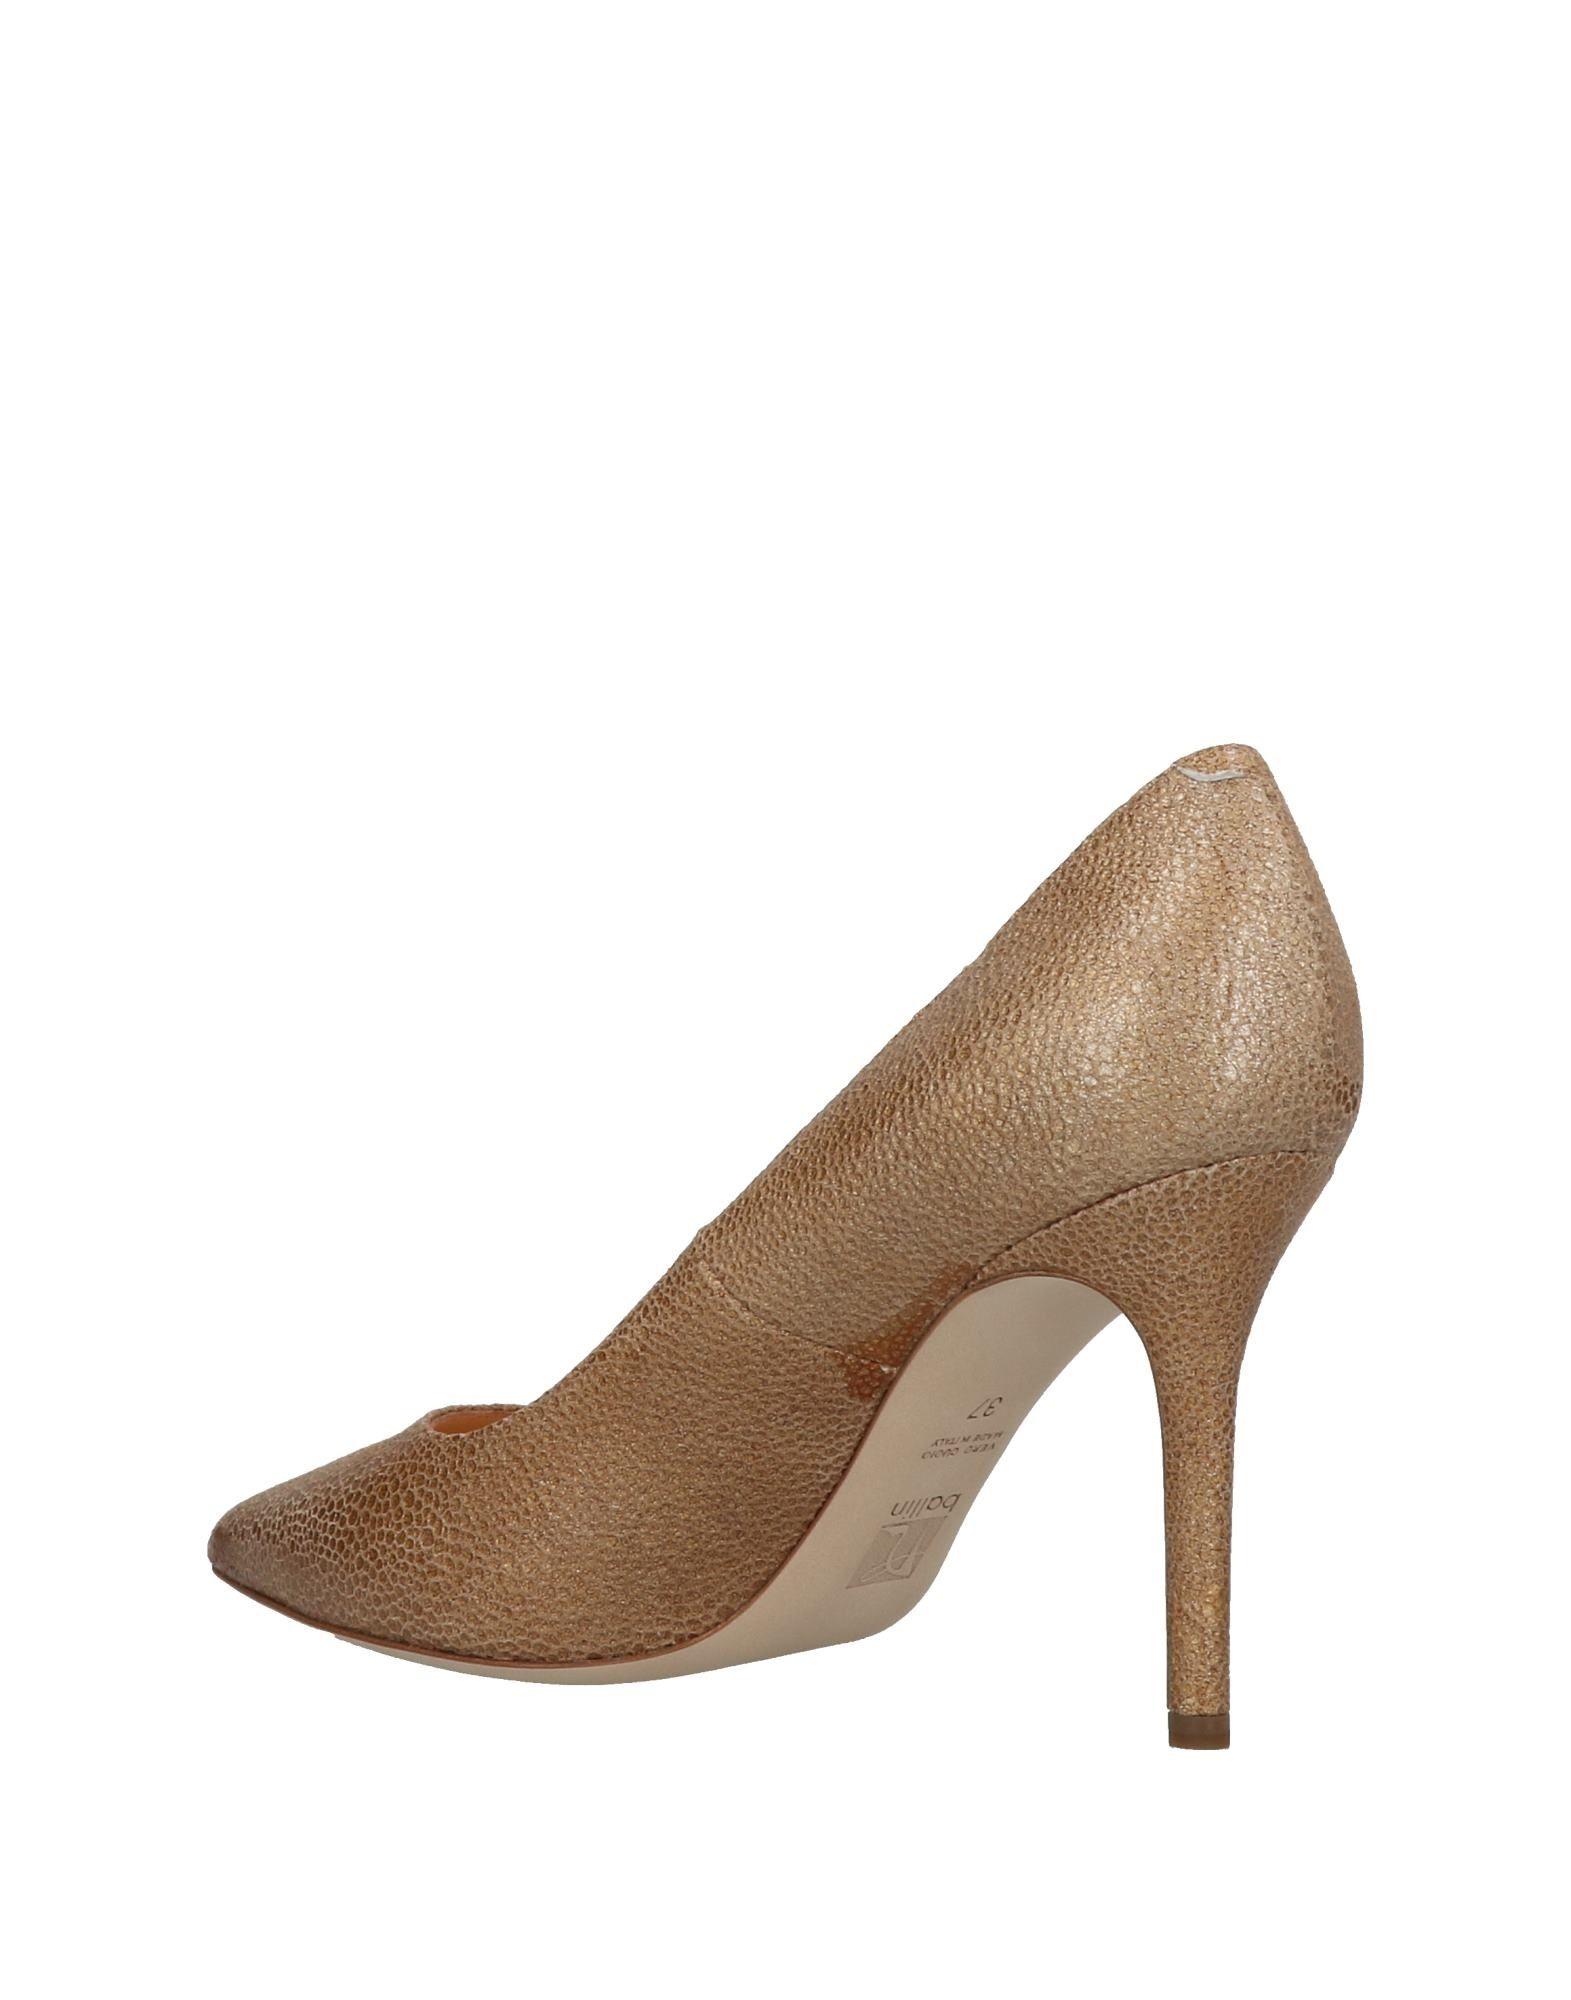 Stilvolle billige Schuhe Damen Ballin Pumps Damen Schuhe  11432513NO 5eeeb0